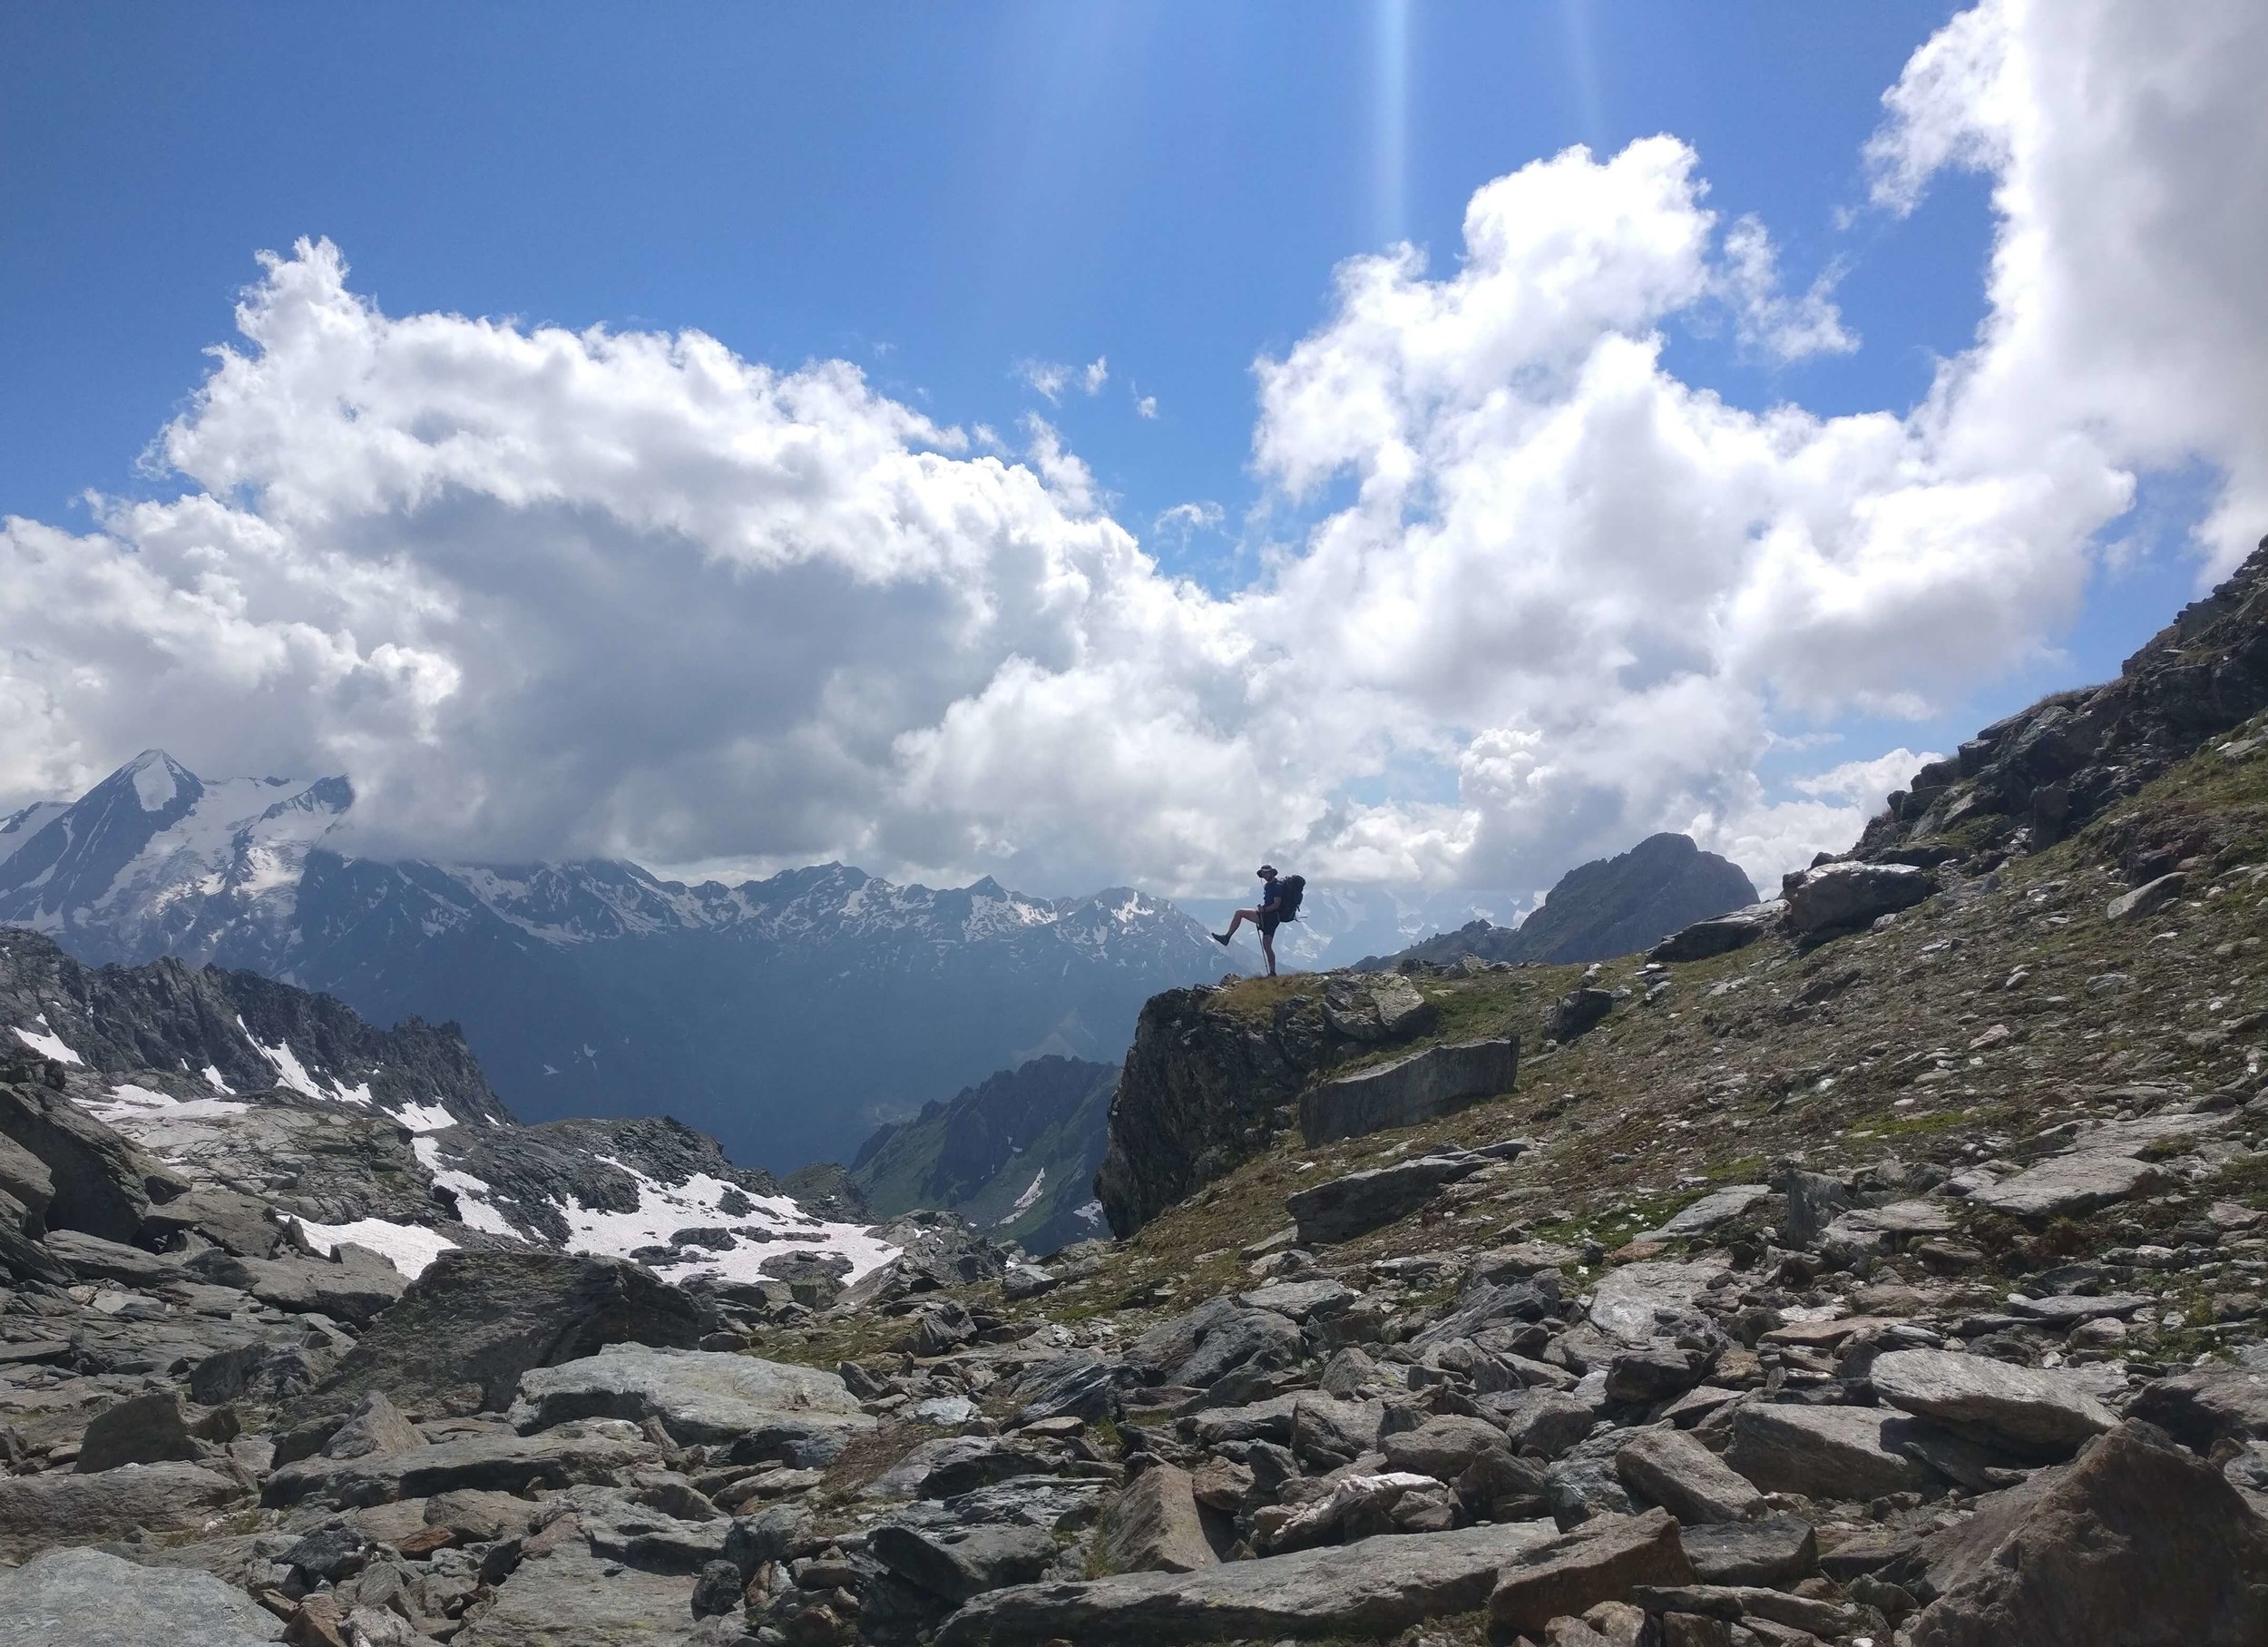 Chamonix to Zermatt distance